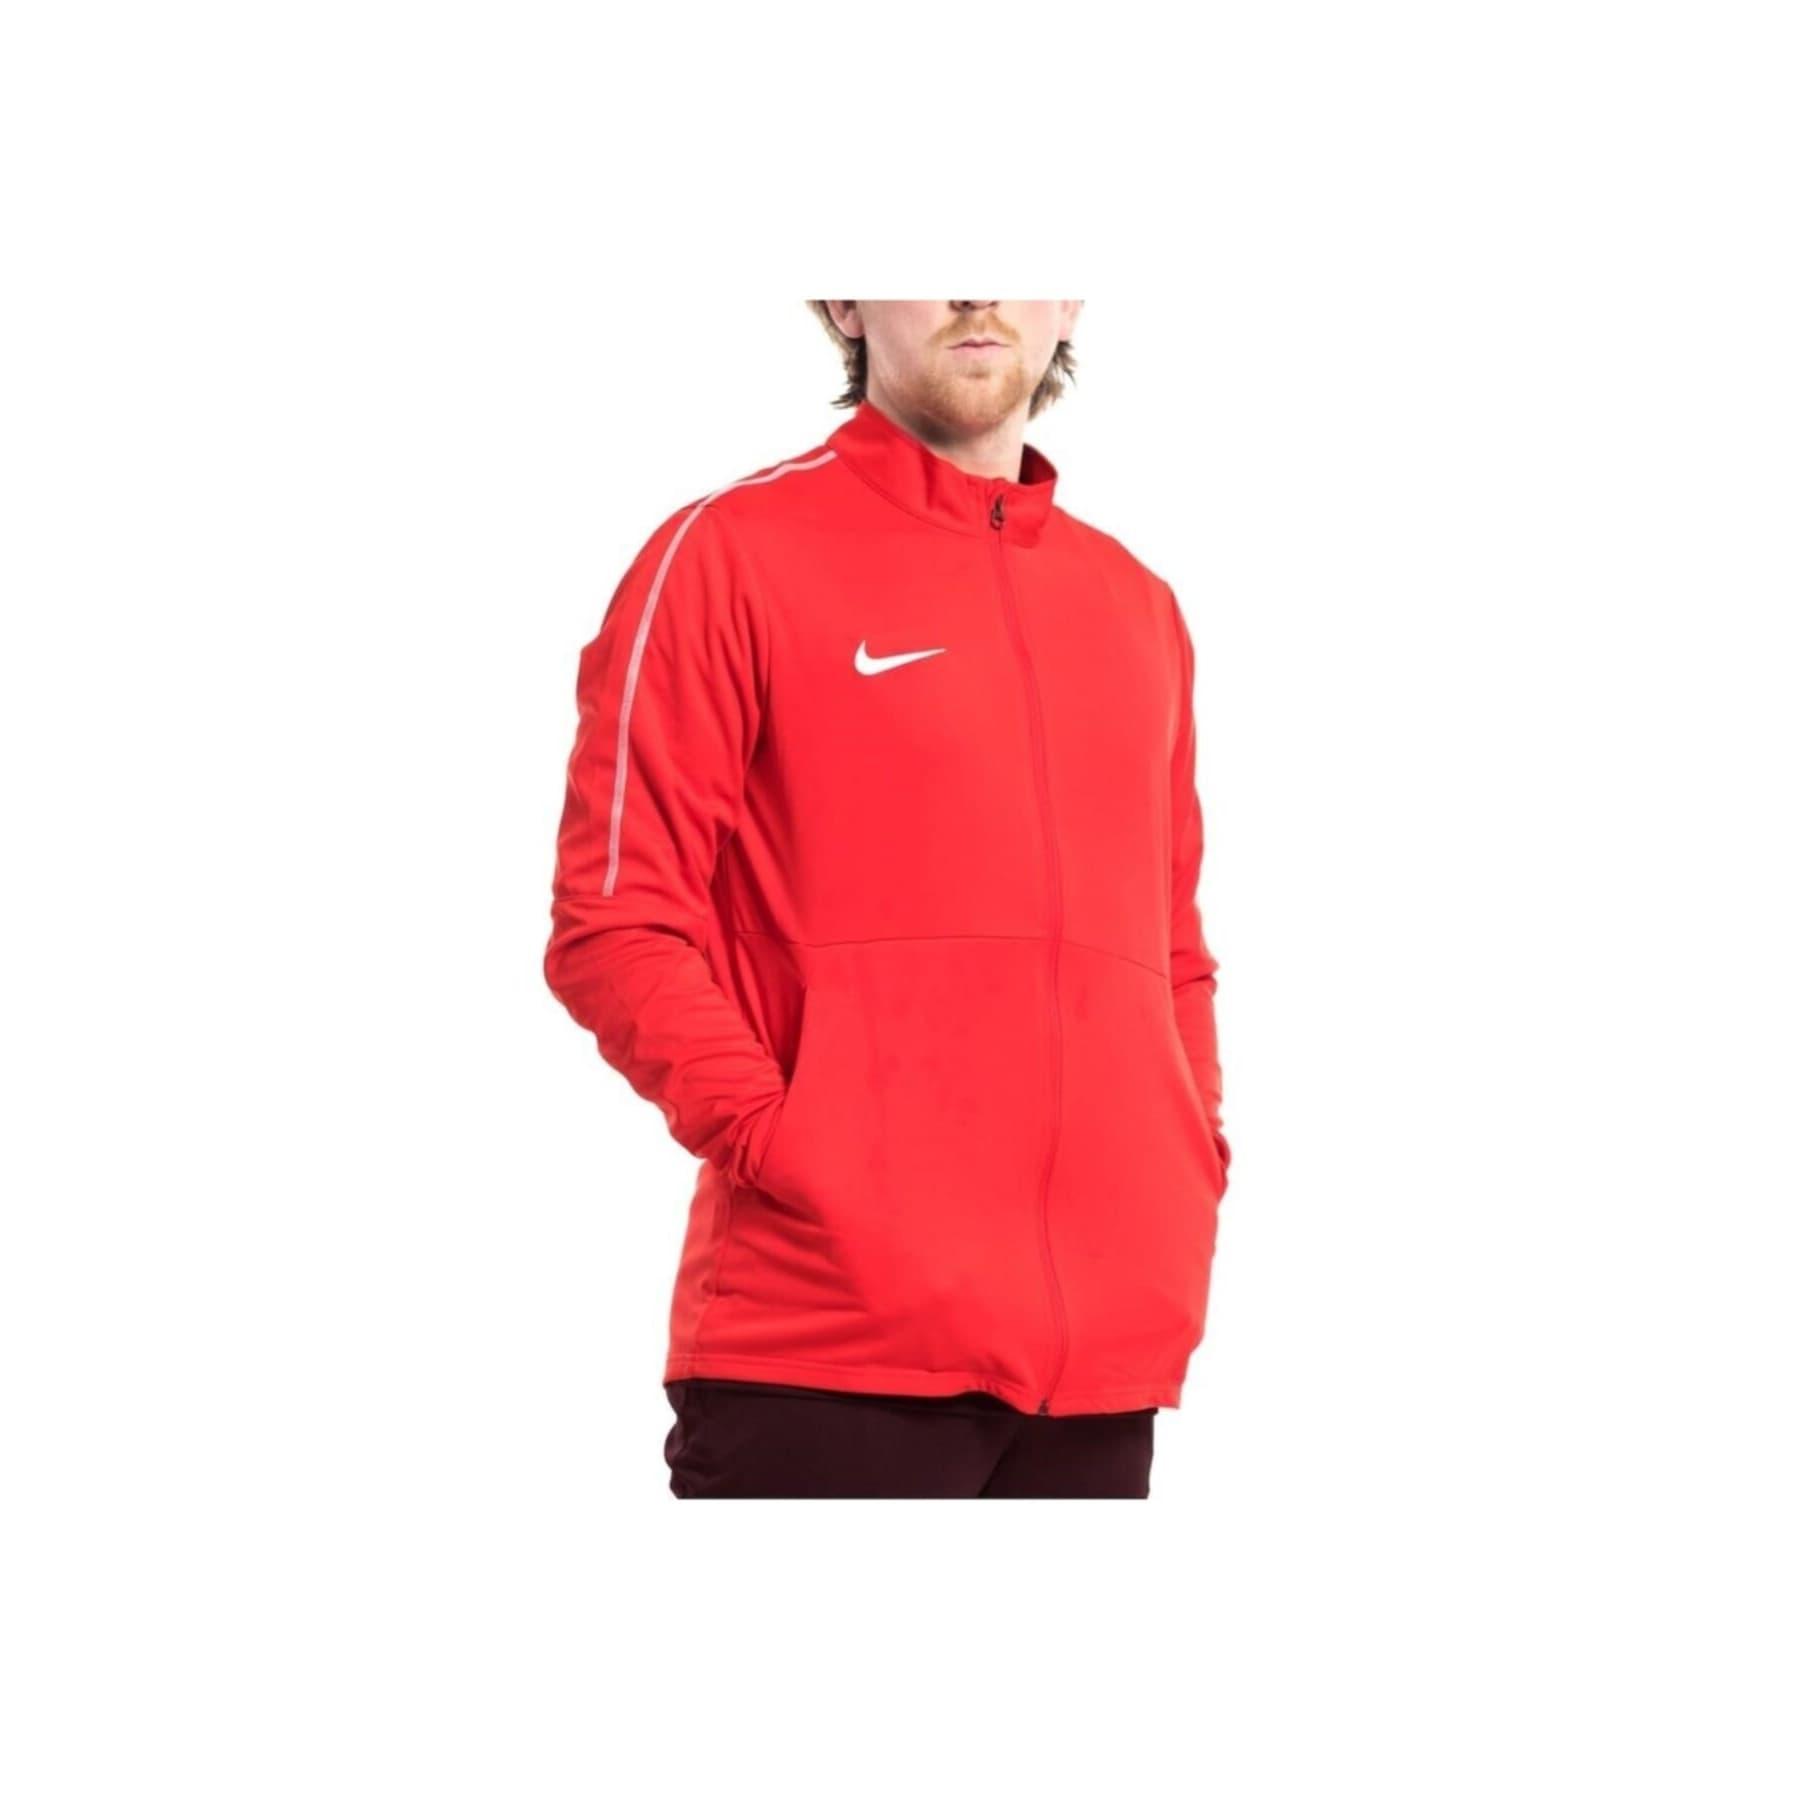 Dri-Fit Park 18 Erkek Kırmızı Eşofman Takımı (AQ5065-657)